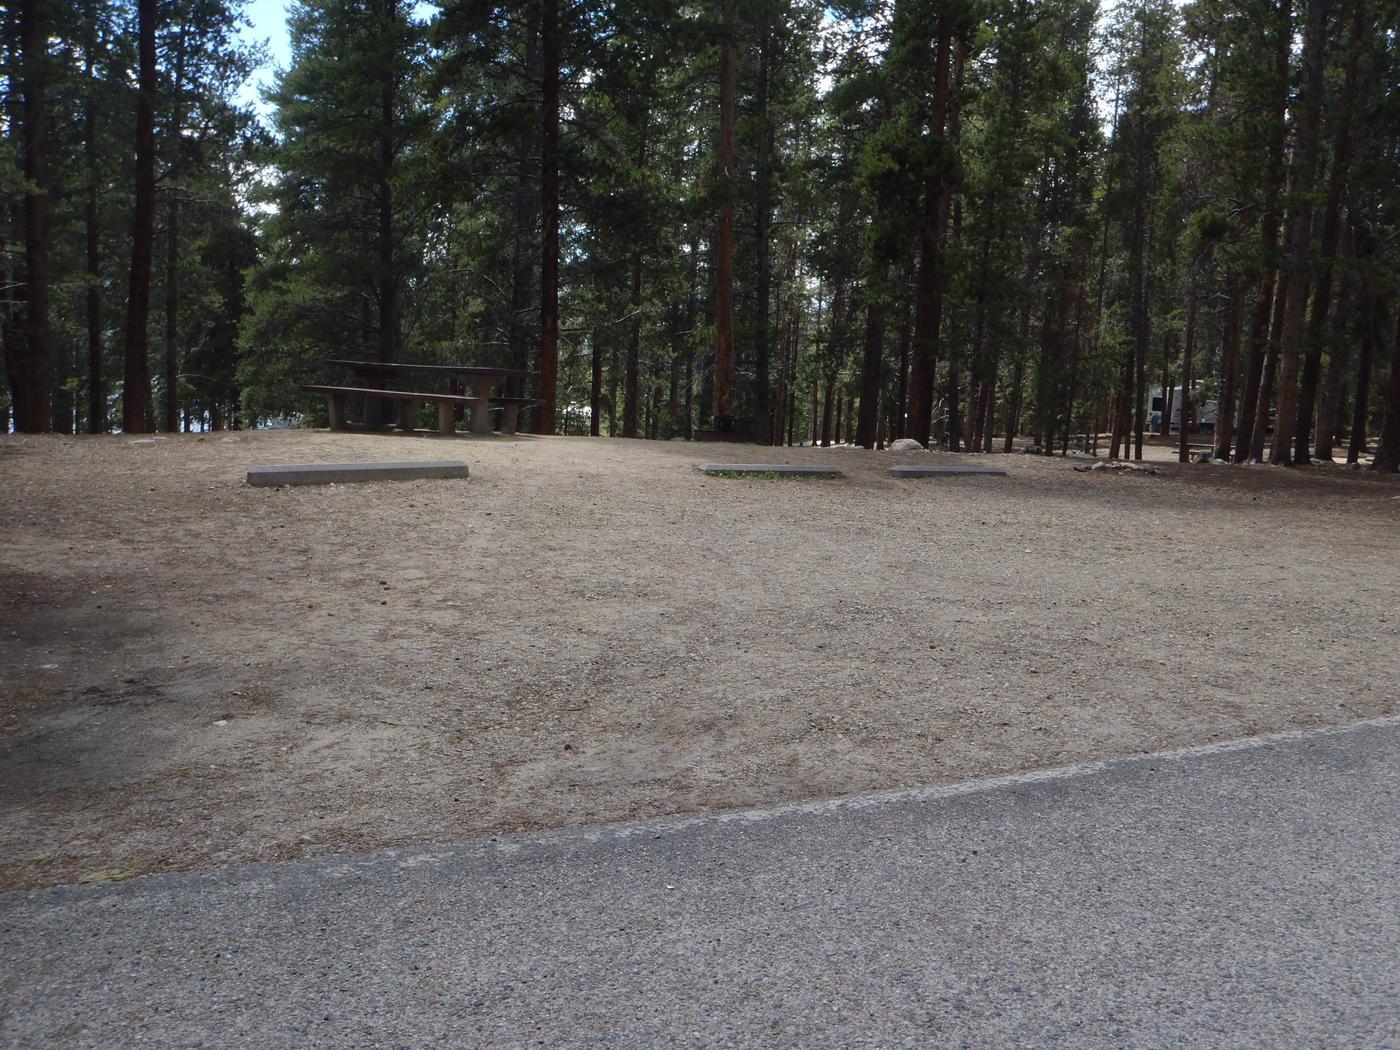 Baby Doe Campground, Site 22 parking